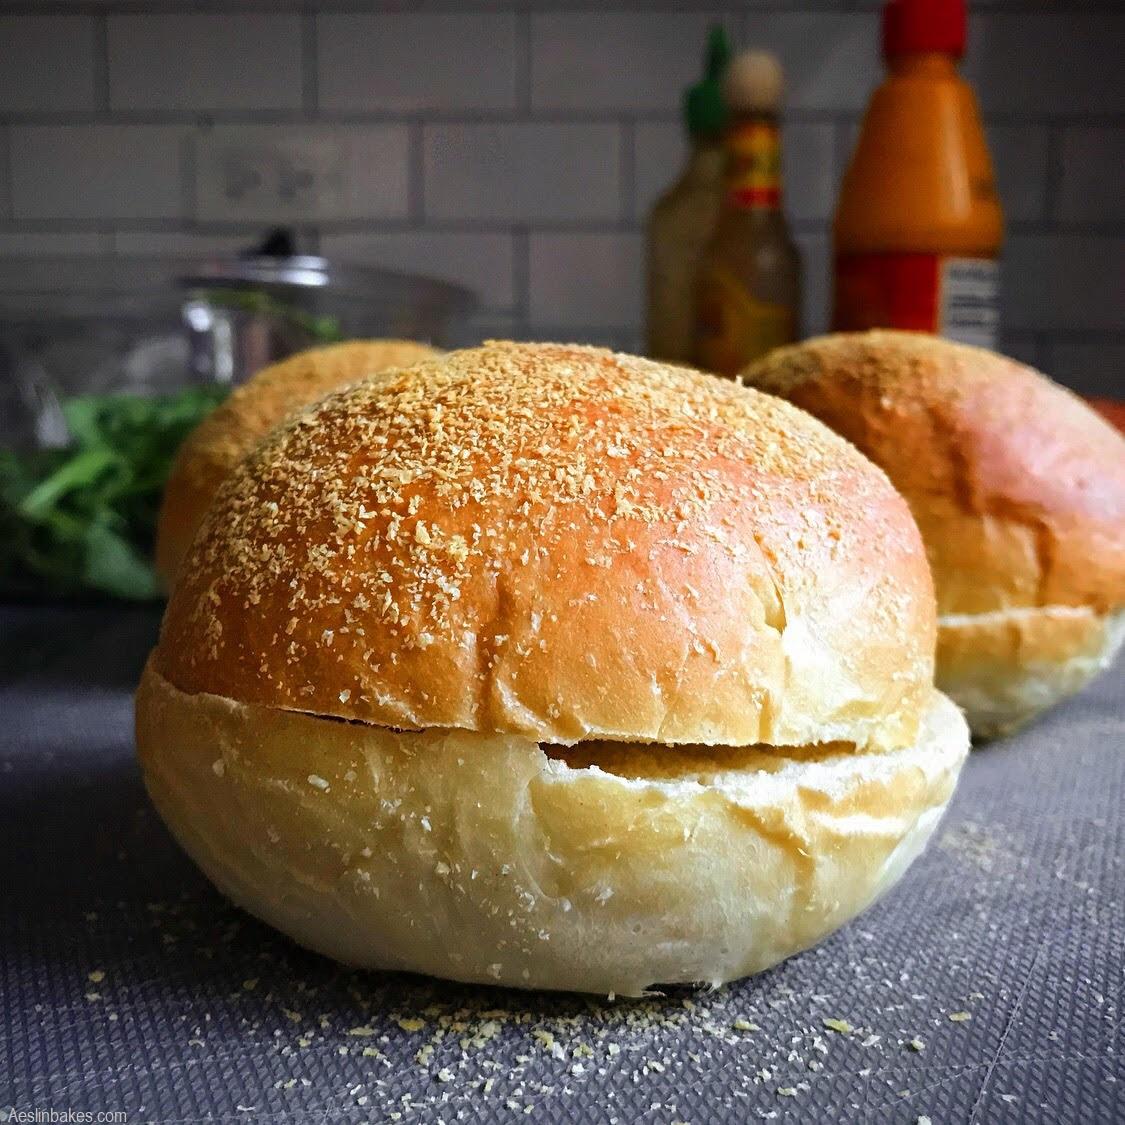 hamburger buns split